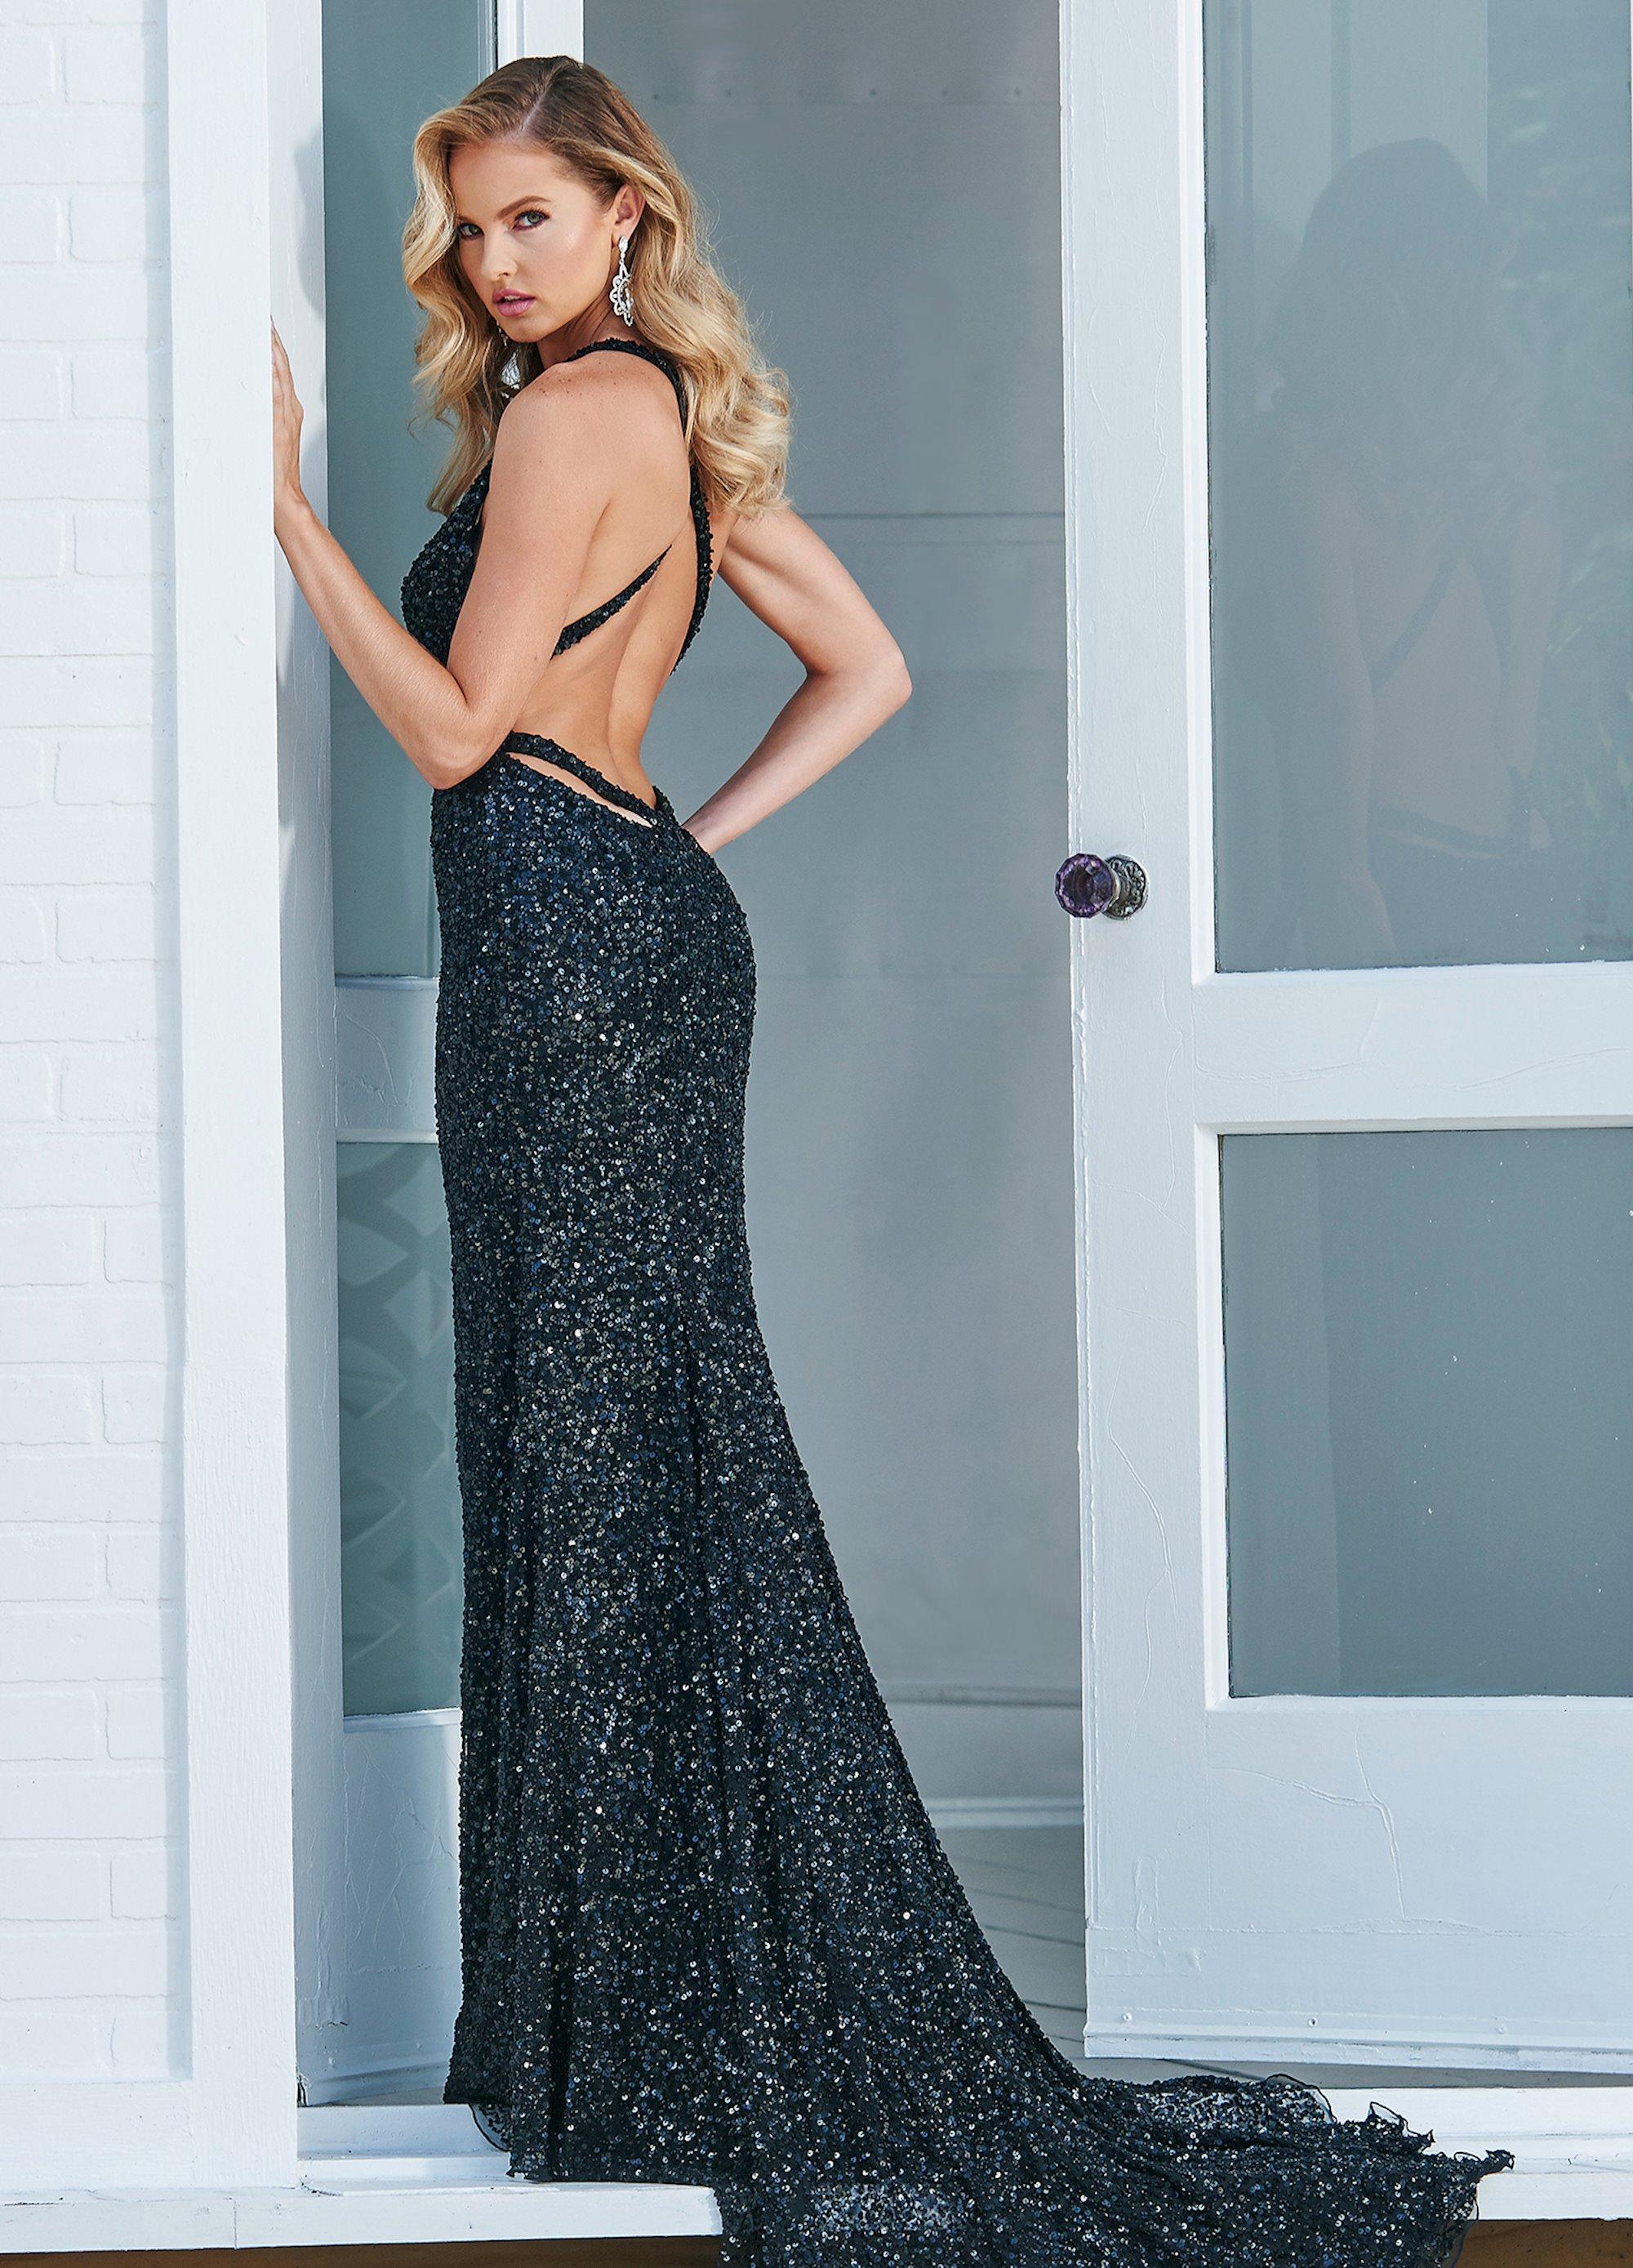 c43a244fb7 Ashley Lauren Open Back Sequin Evening Dress. Double tap to zoom